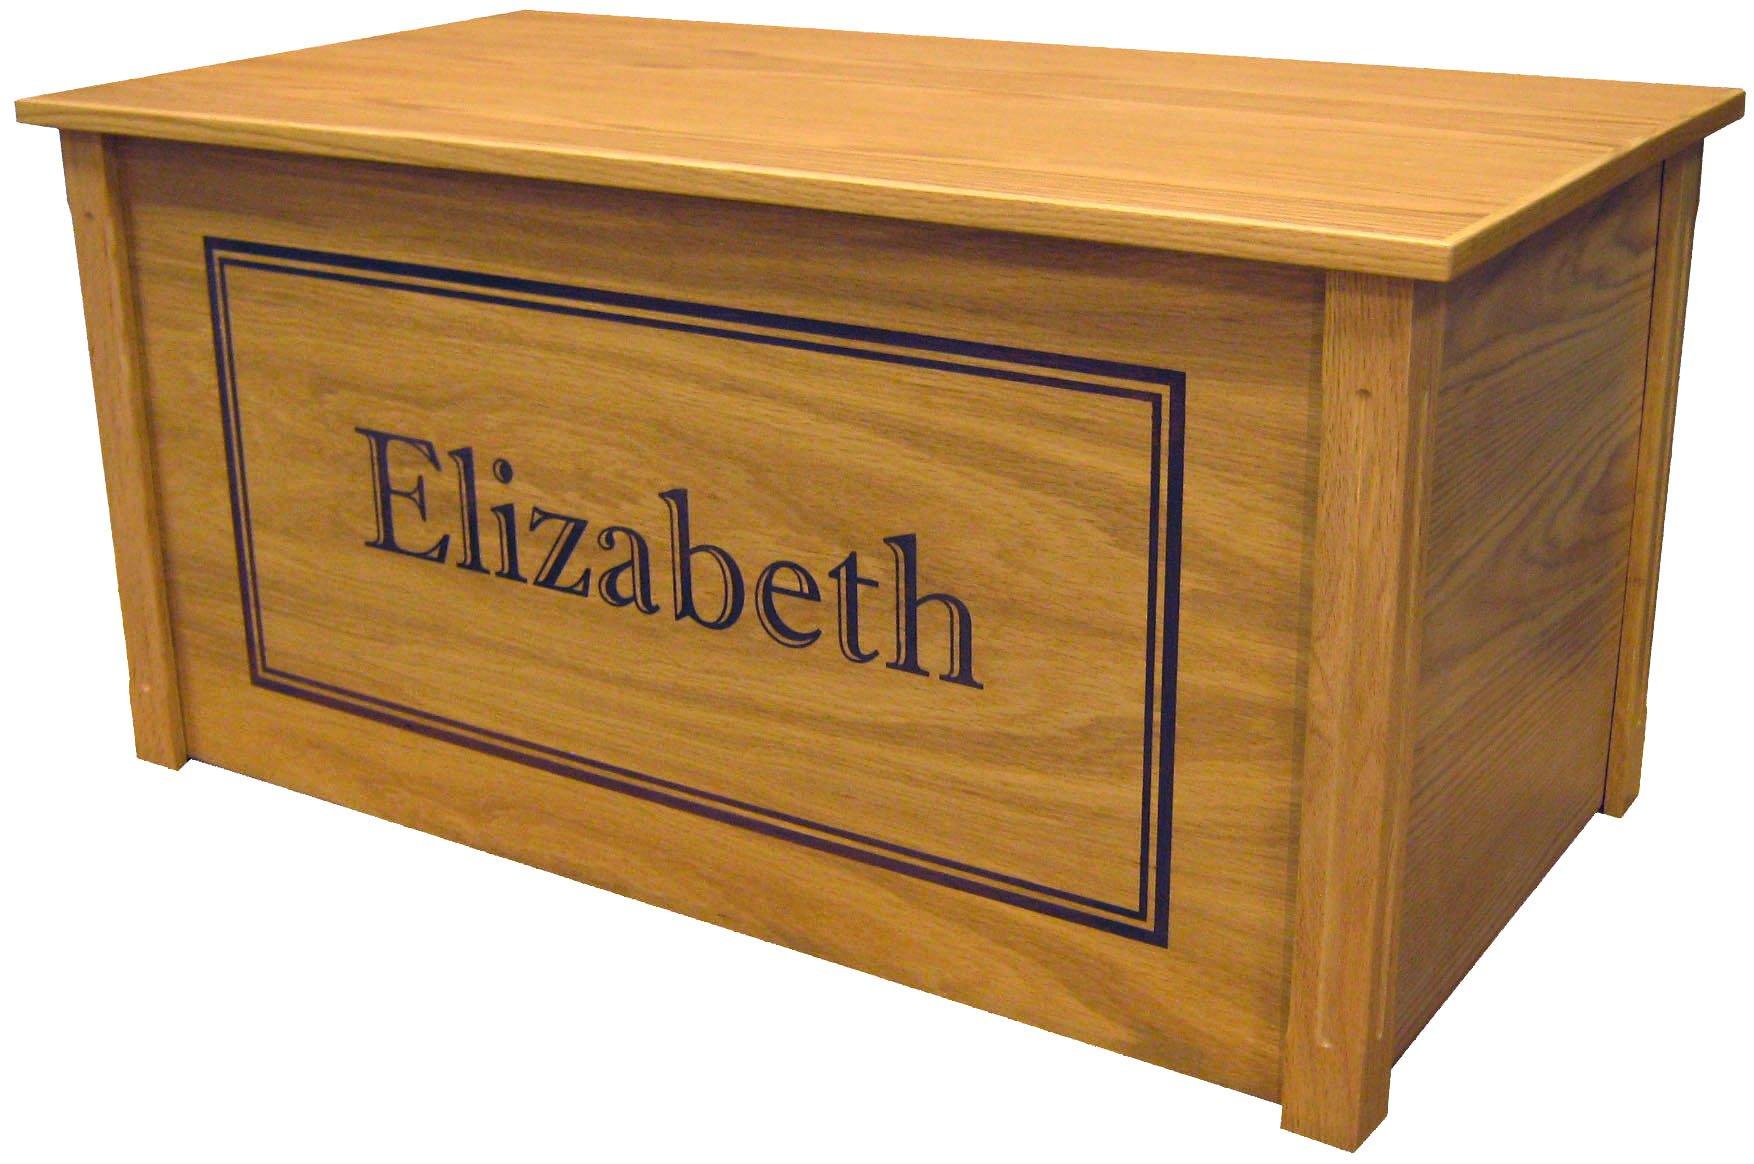 Wood Toy Box, Large Oak Toy Chest, Personalized Shadow Font, Custom Options (Cedar Base)